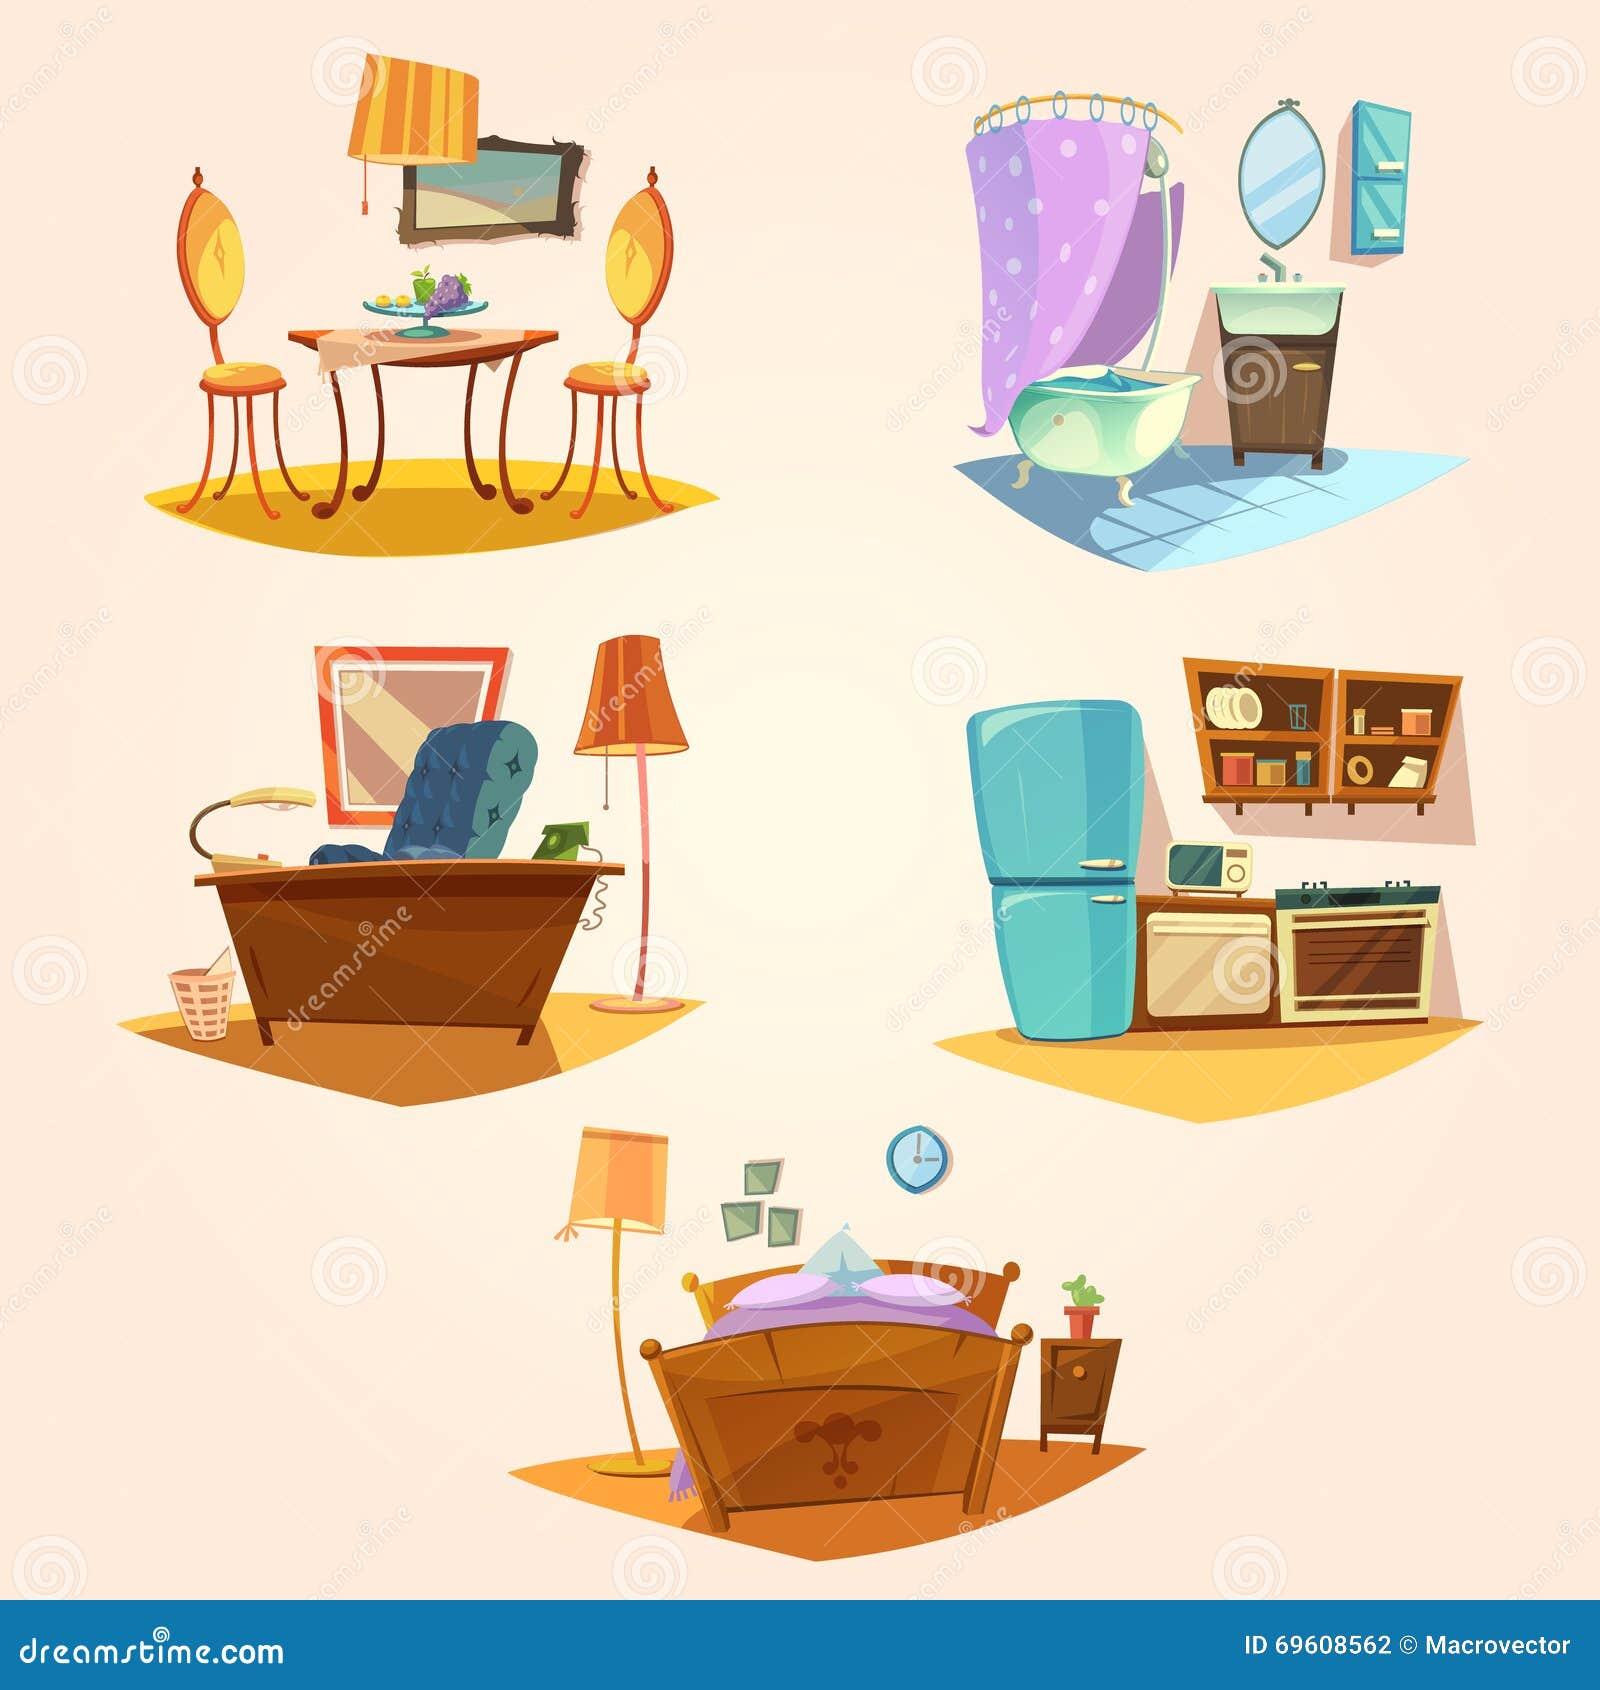 Cartoon Furniture: Interior Cartoon Retro Set Stock Vector. Illustration Of